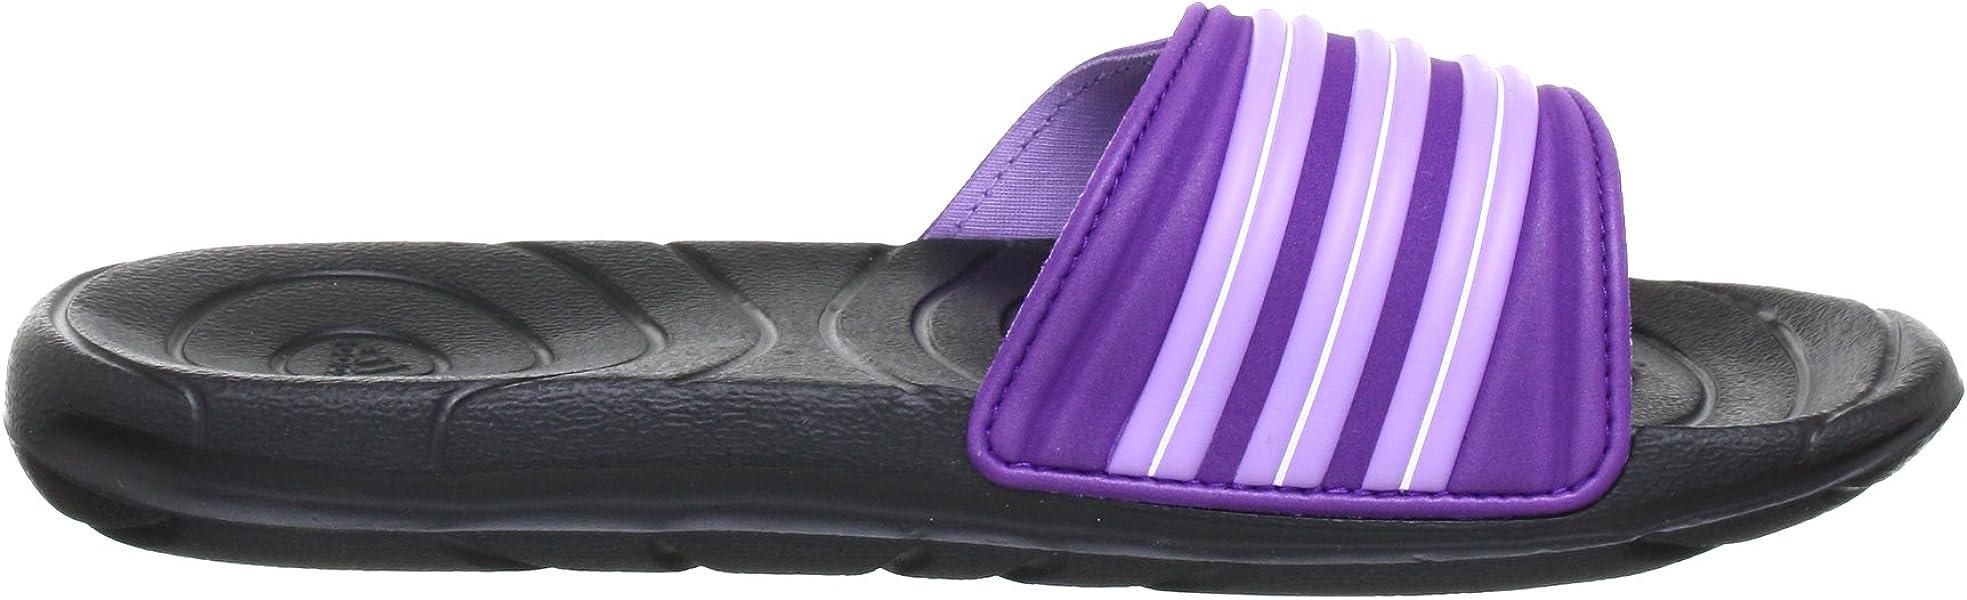 buy popular a509d a3a5b ... Sandalias de Material sintético Mujer. adidas Performance Taedia Vario  W, Chanclas para Mujer, Mehrfarbig (Black 1   Power. Atrás. Pulsa ...